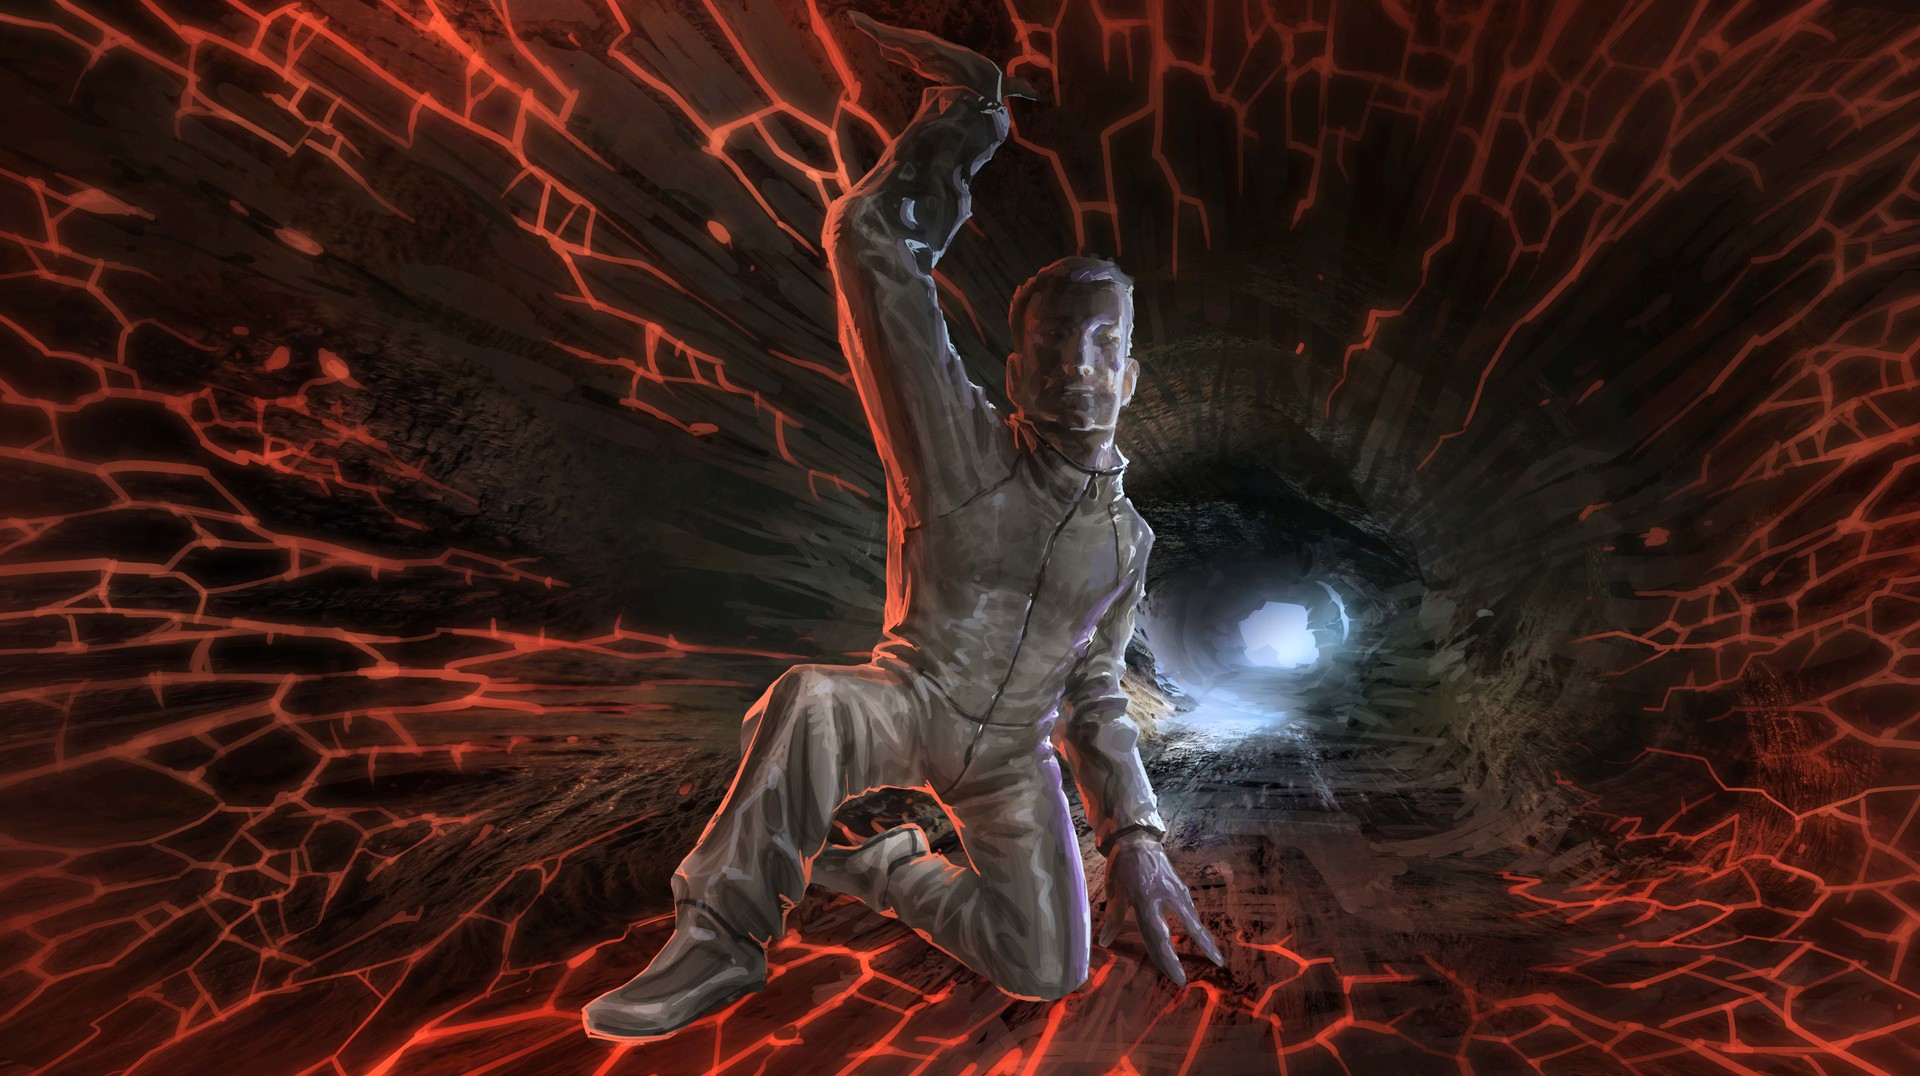 Rustam hasanov rising heat tunnelb